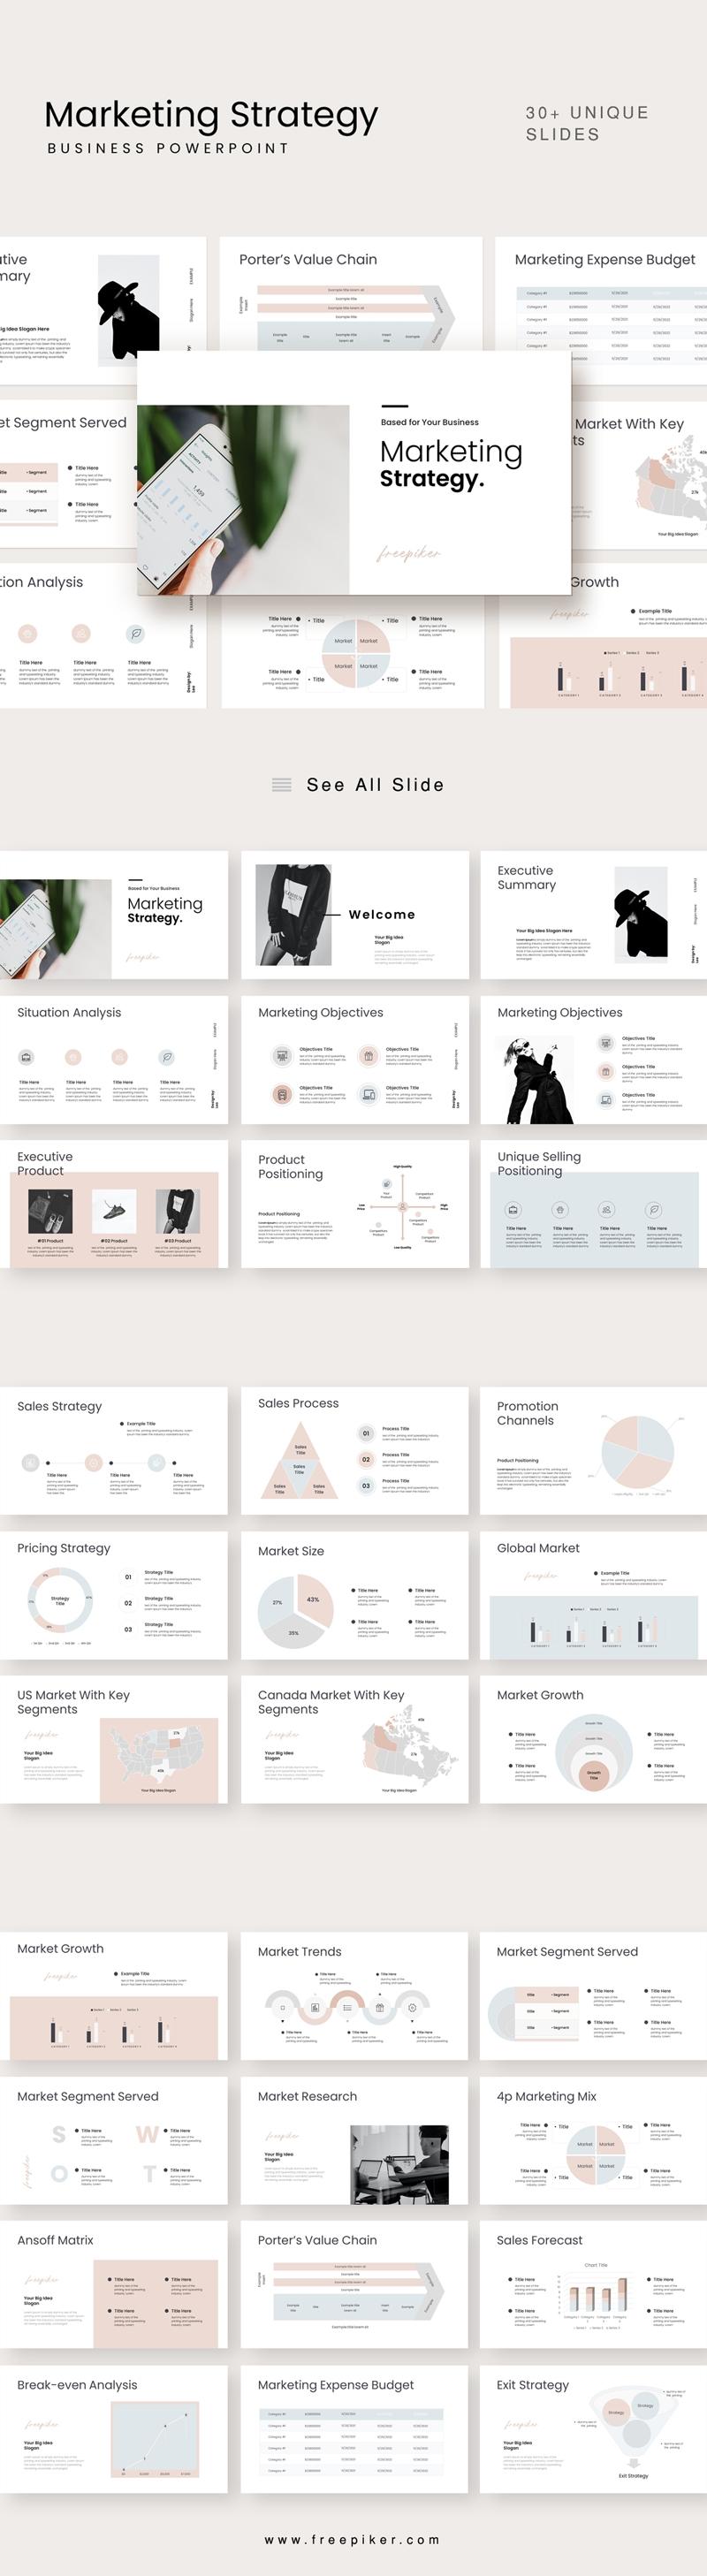 Digital Marketing Strategy PowerPoint Presentation